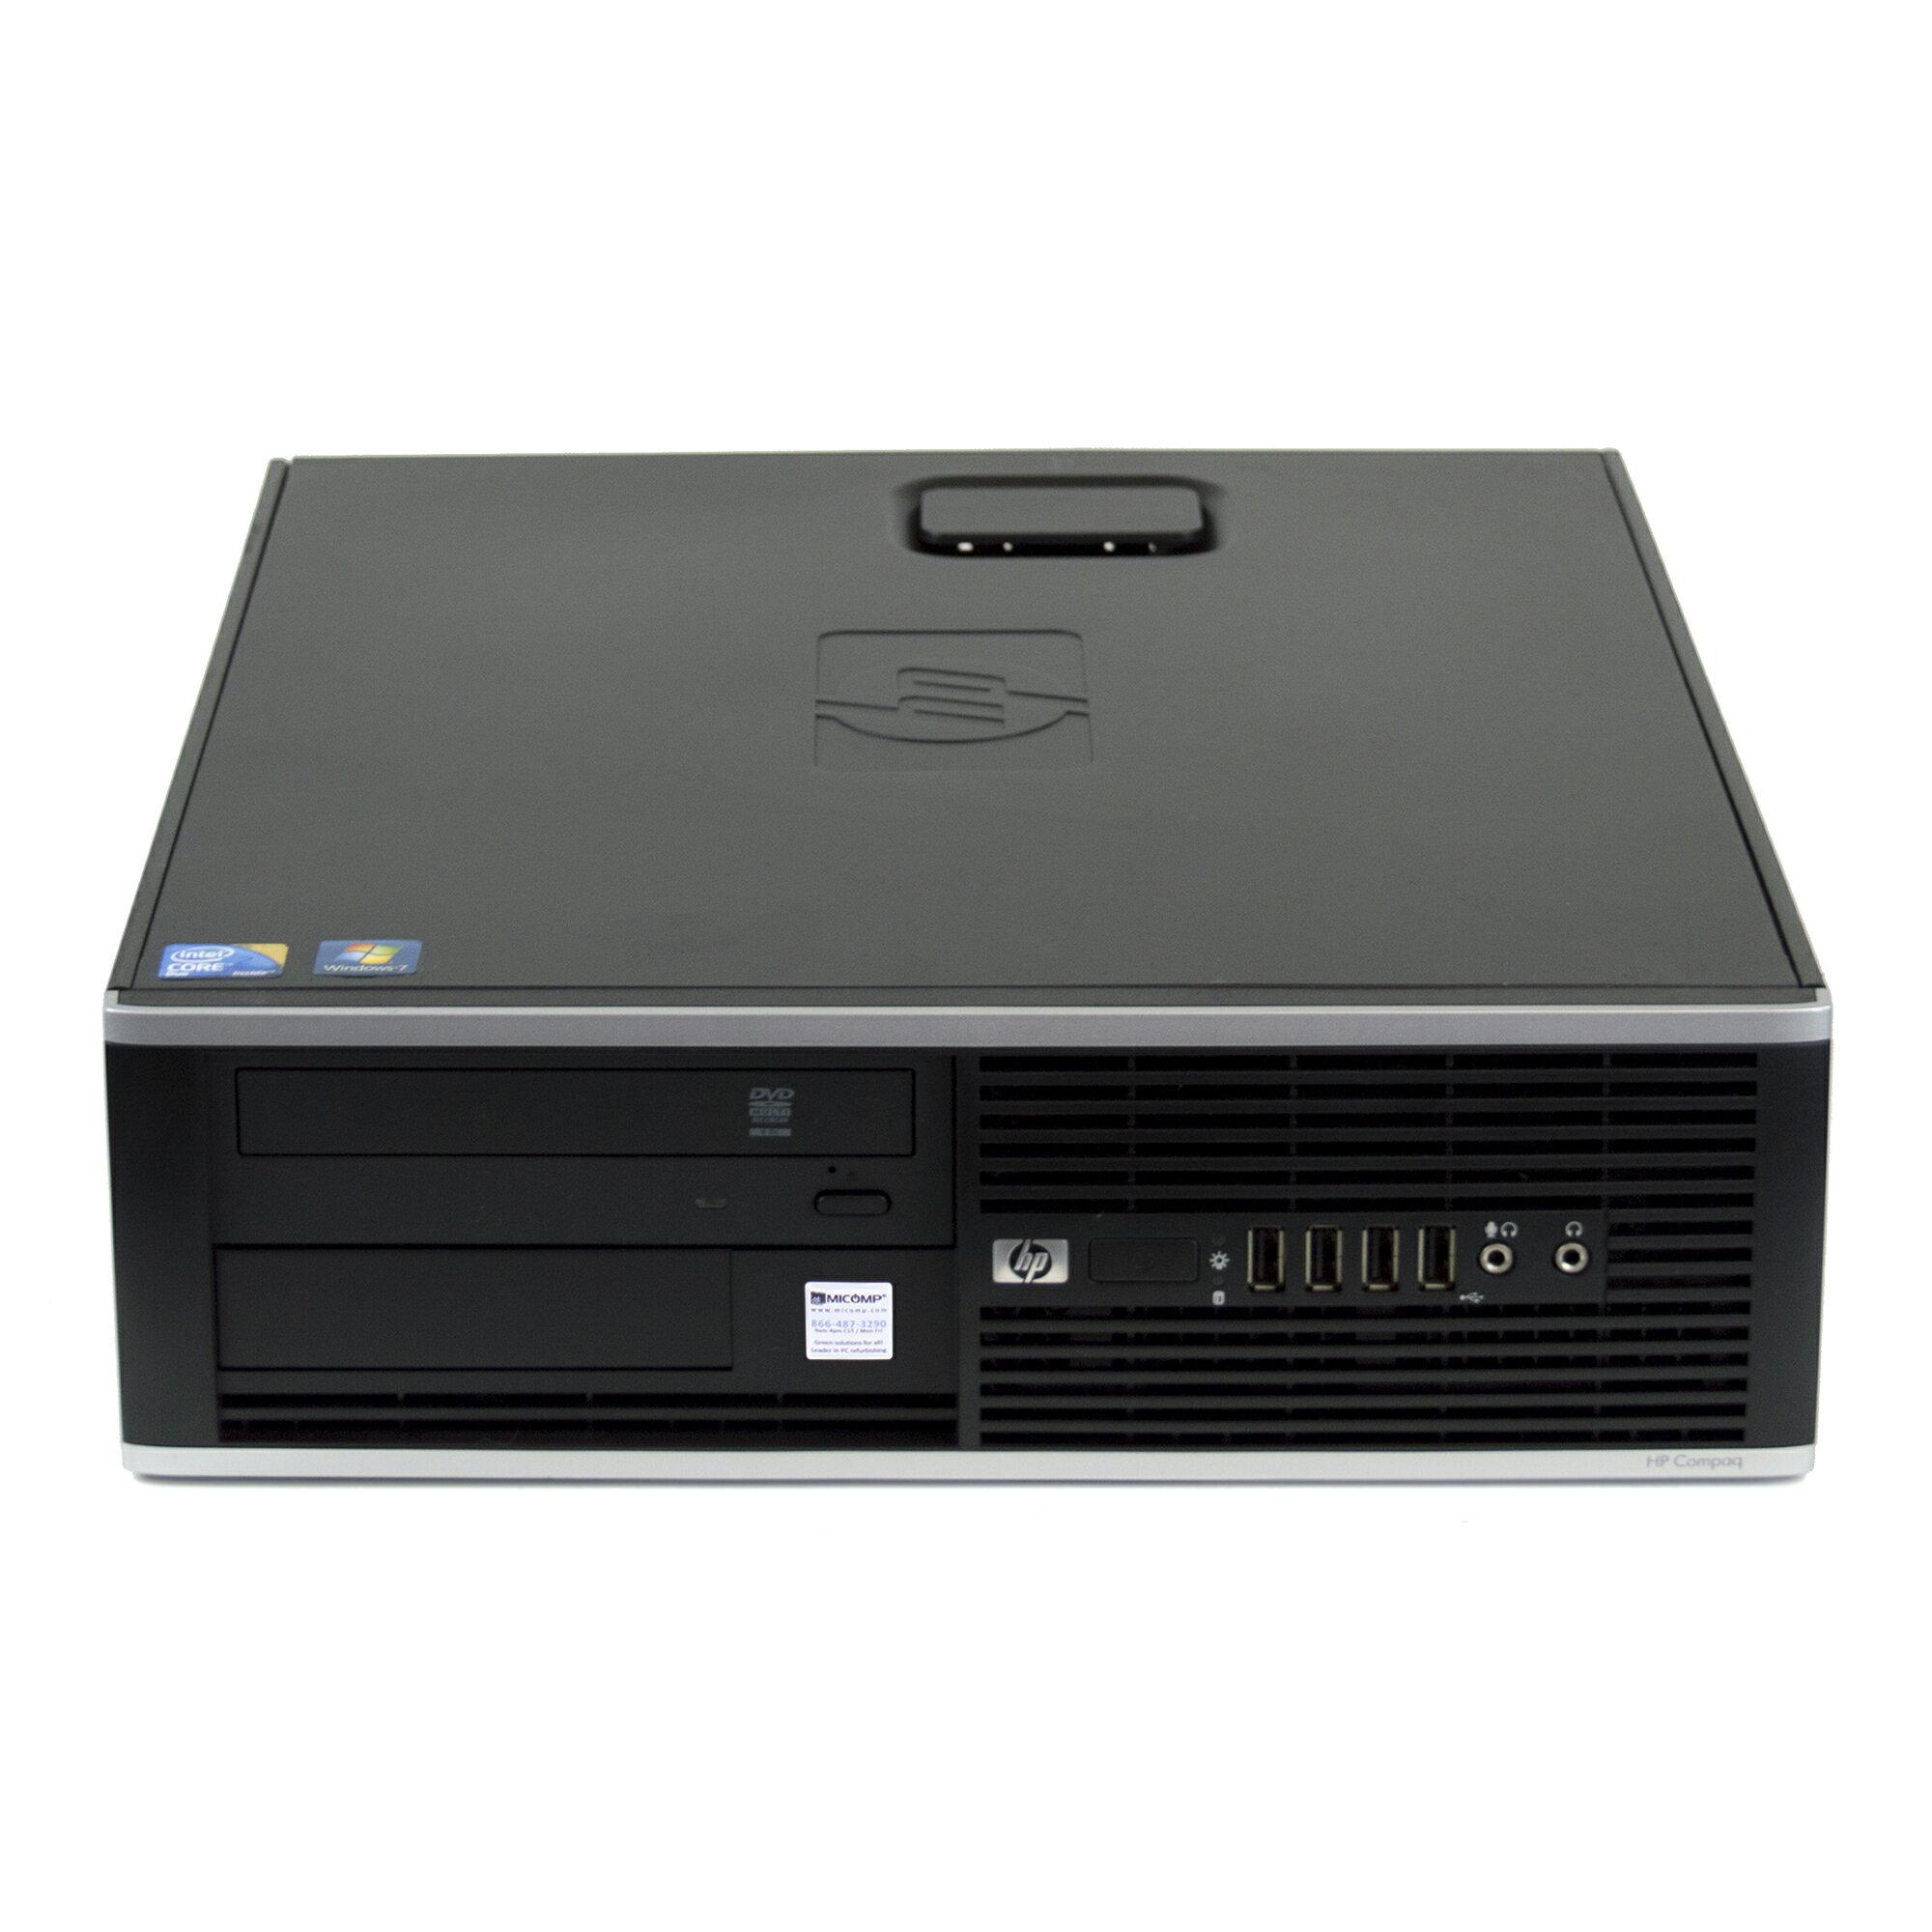 HP ELITE 8300 SFF DESKTOP i5-3470 QUAD CORE 3 2Ghz 8GB 500GB DVD WINDOWS 10  PRO 64BIT 1 YR WARRANTY